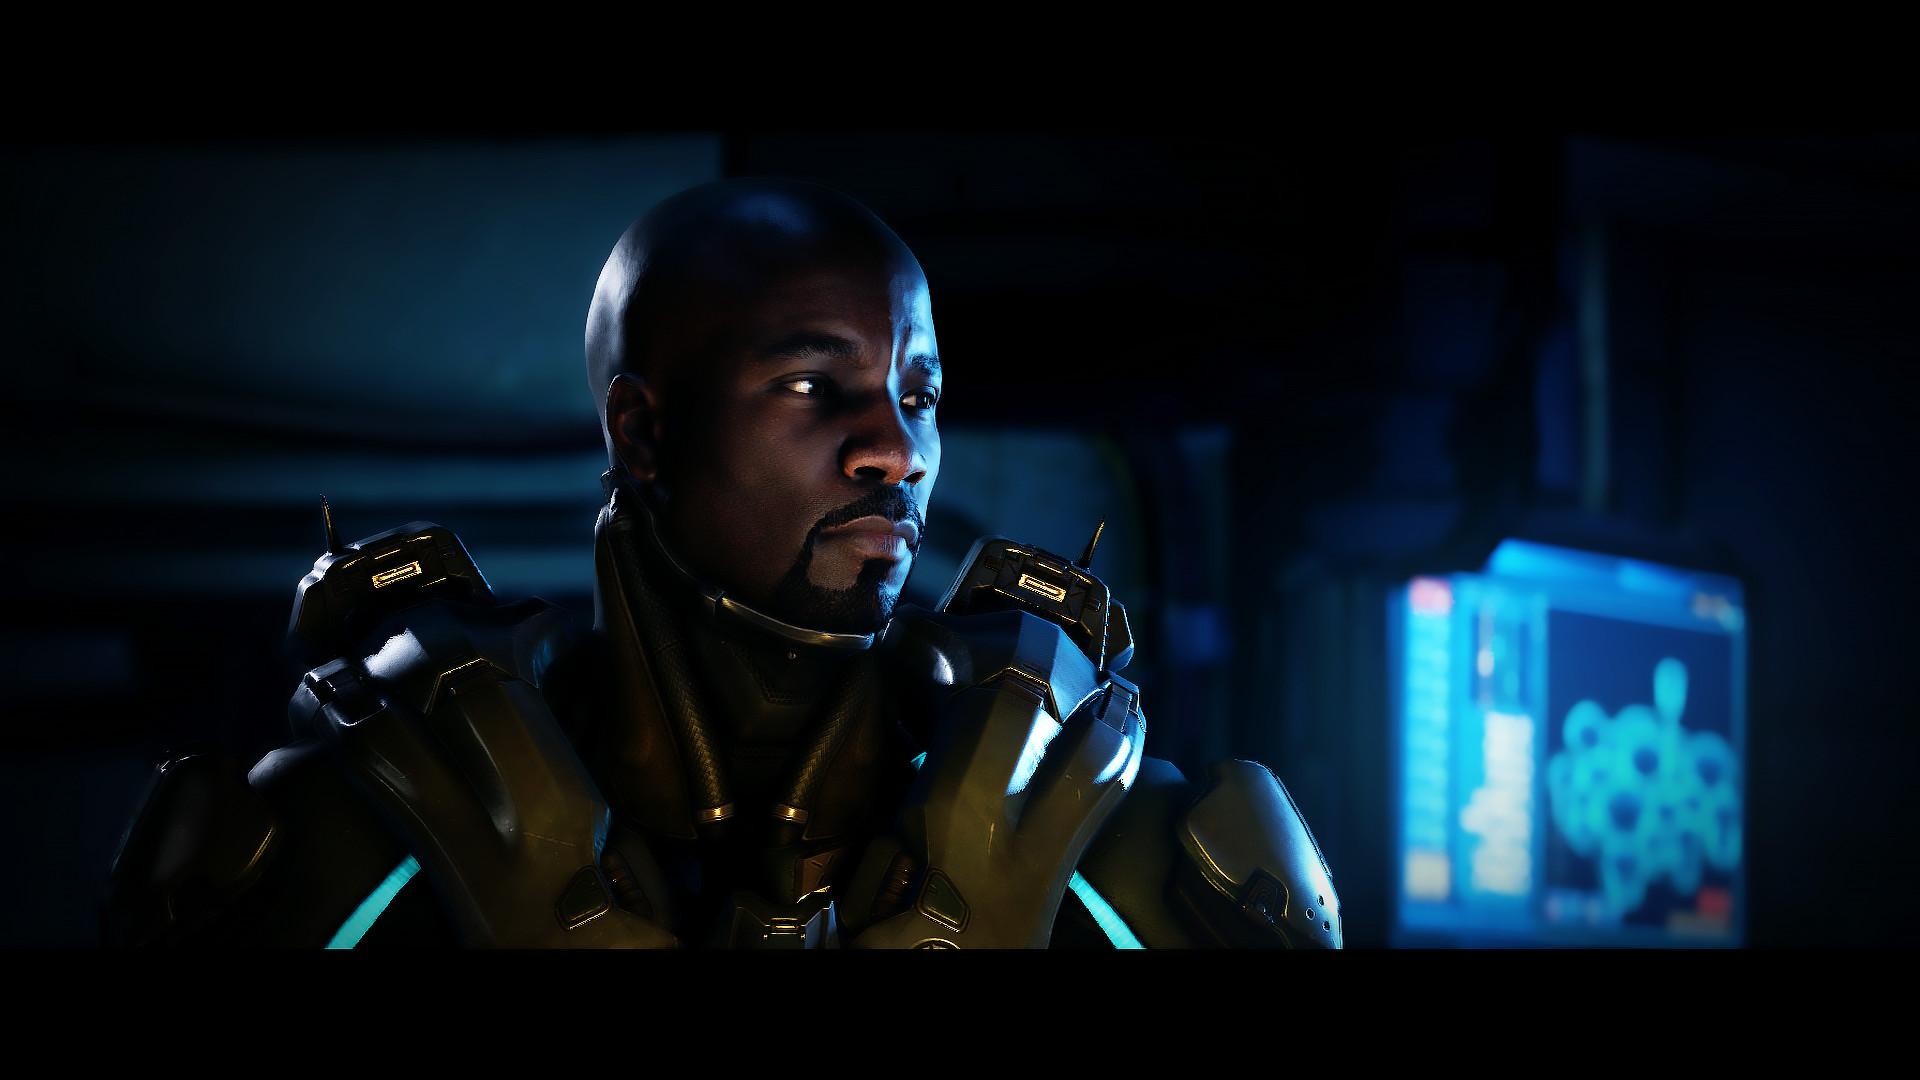 General Halo Arbiter Spartan Locke Cortana Master Chief Halo 5:  Guardians